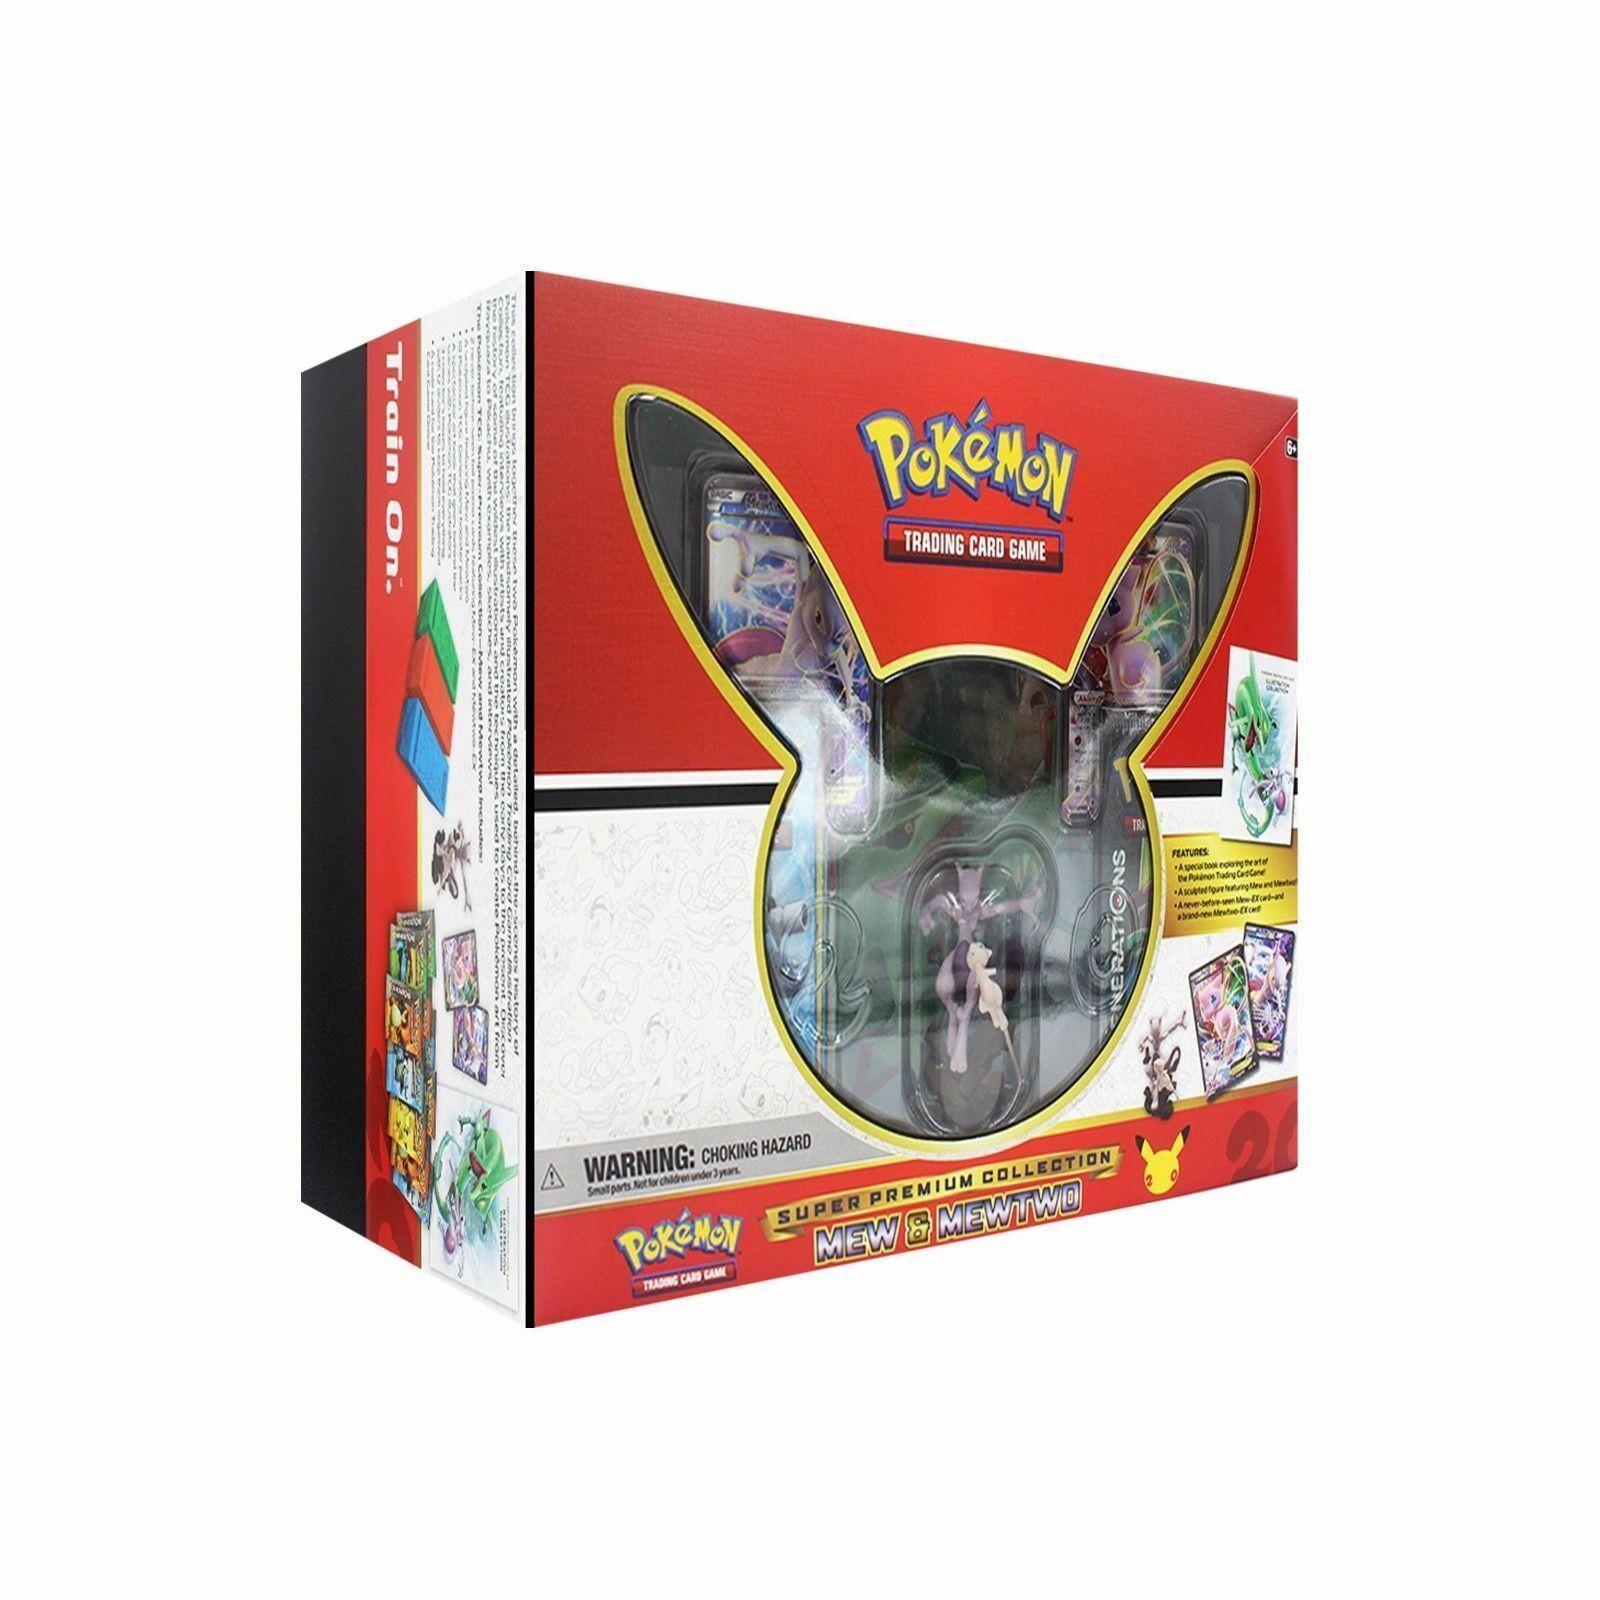 Pokemon Shining Legends Ho-Oh + Mew Mewtwo Super Premium Collection Boxes Bundle image 5